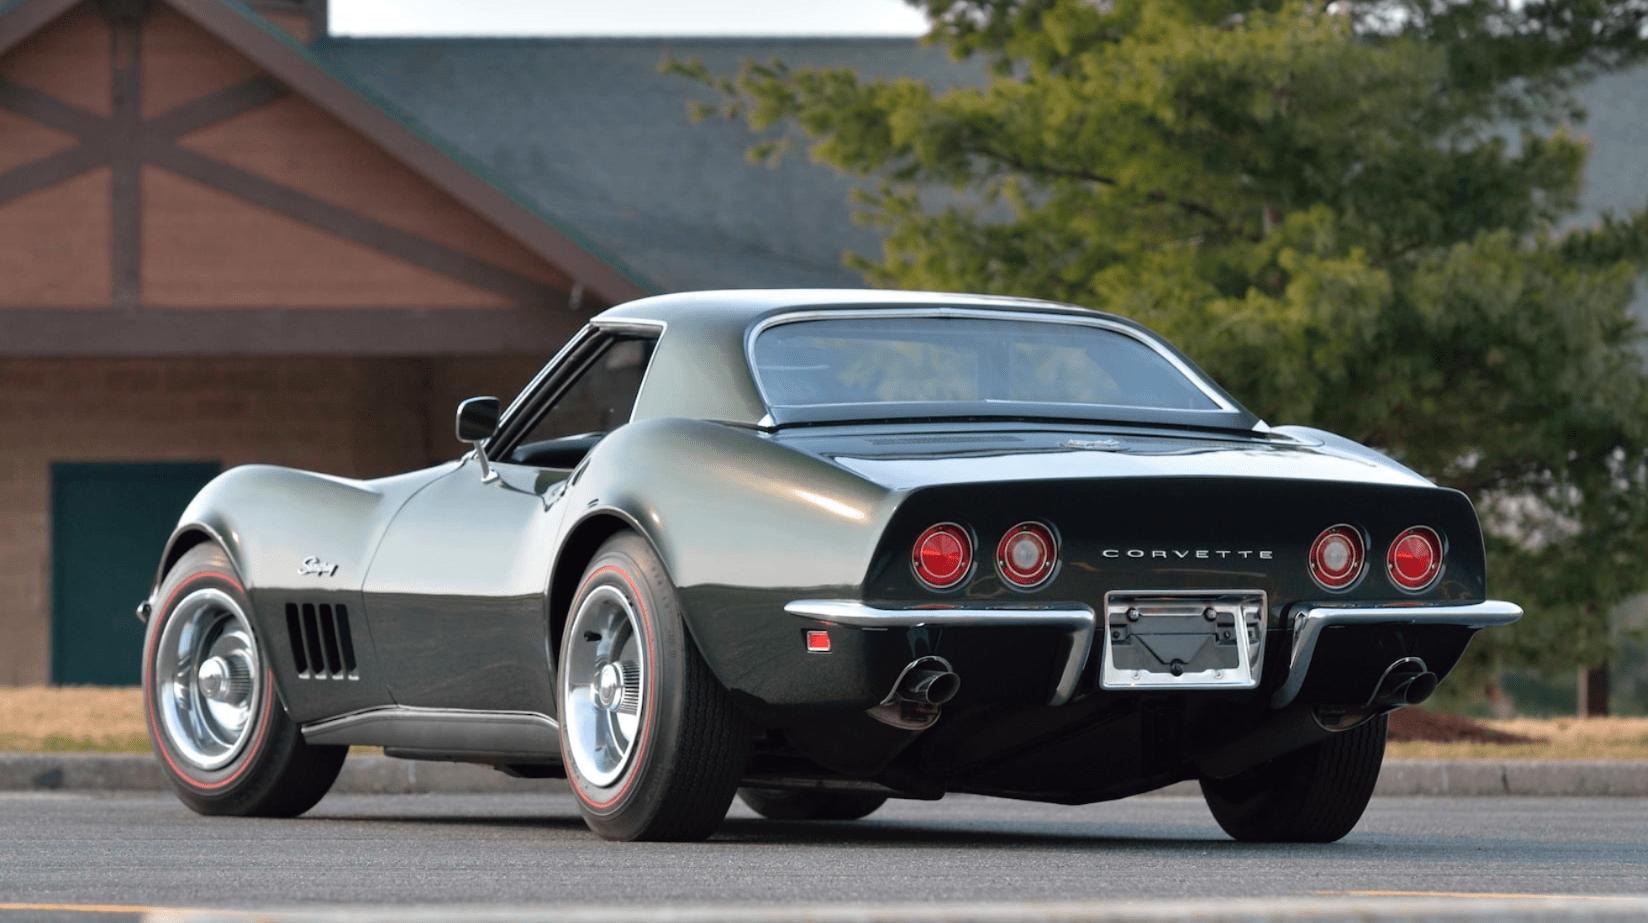 Finance a Corvette